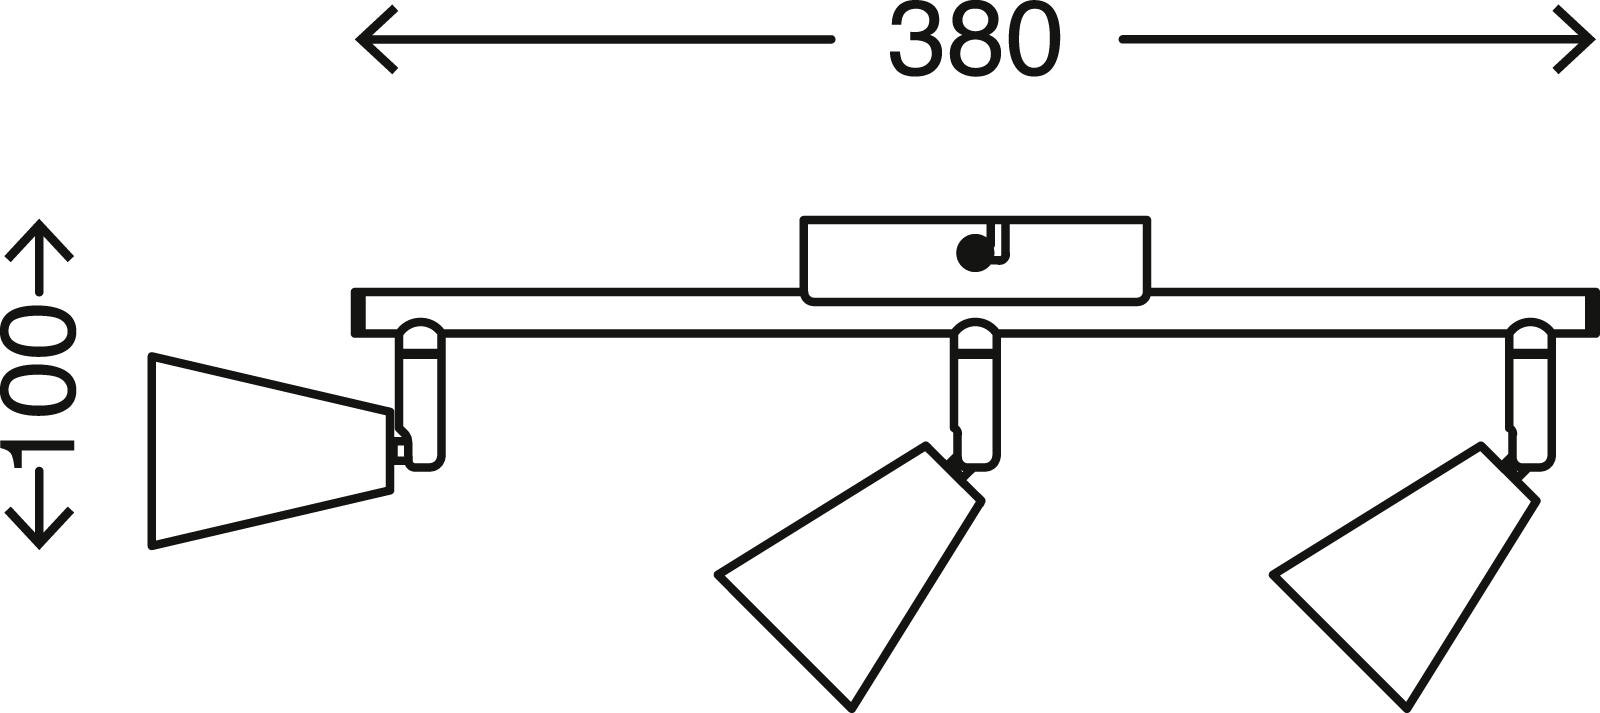 LED Spot Deckenleuchte, 38 cm, 15 W, Gold